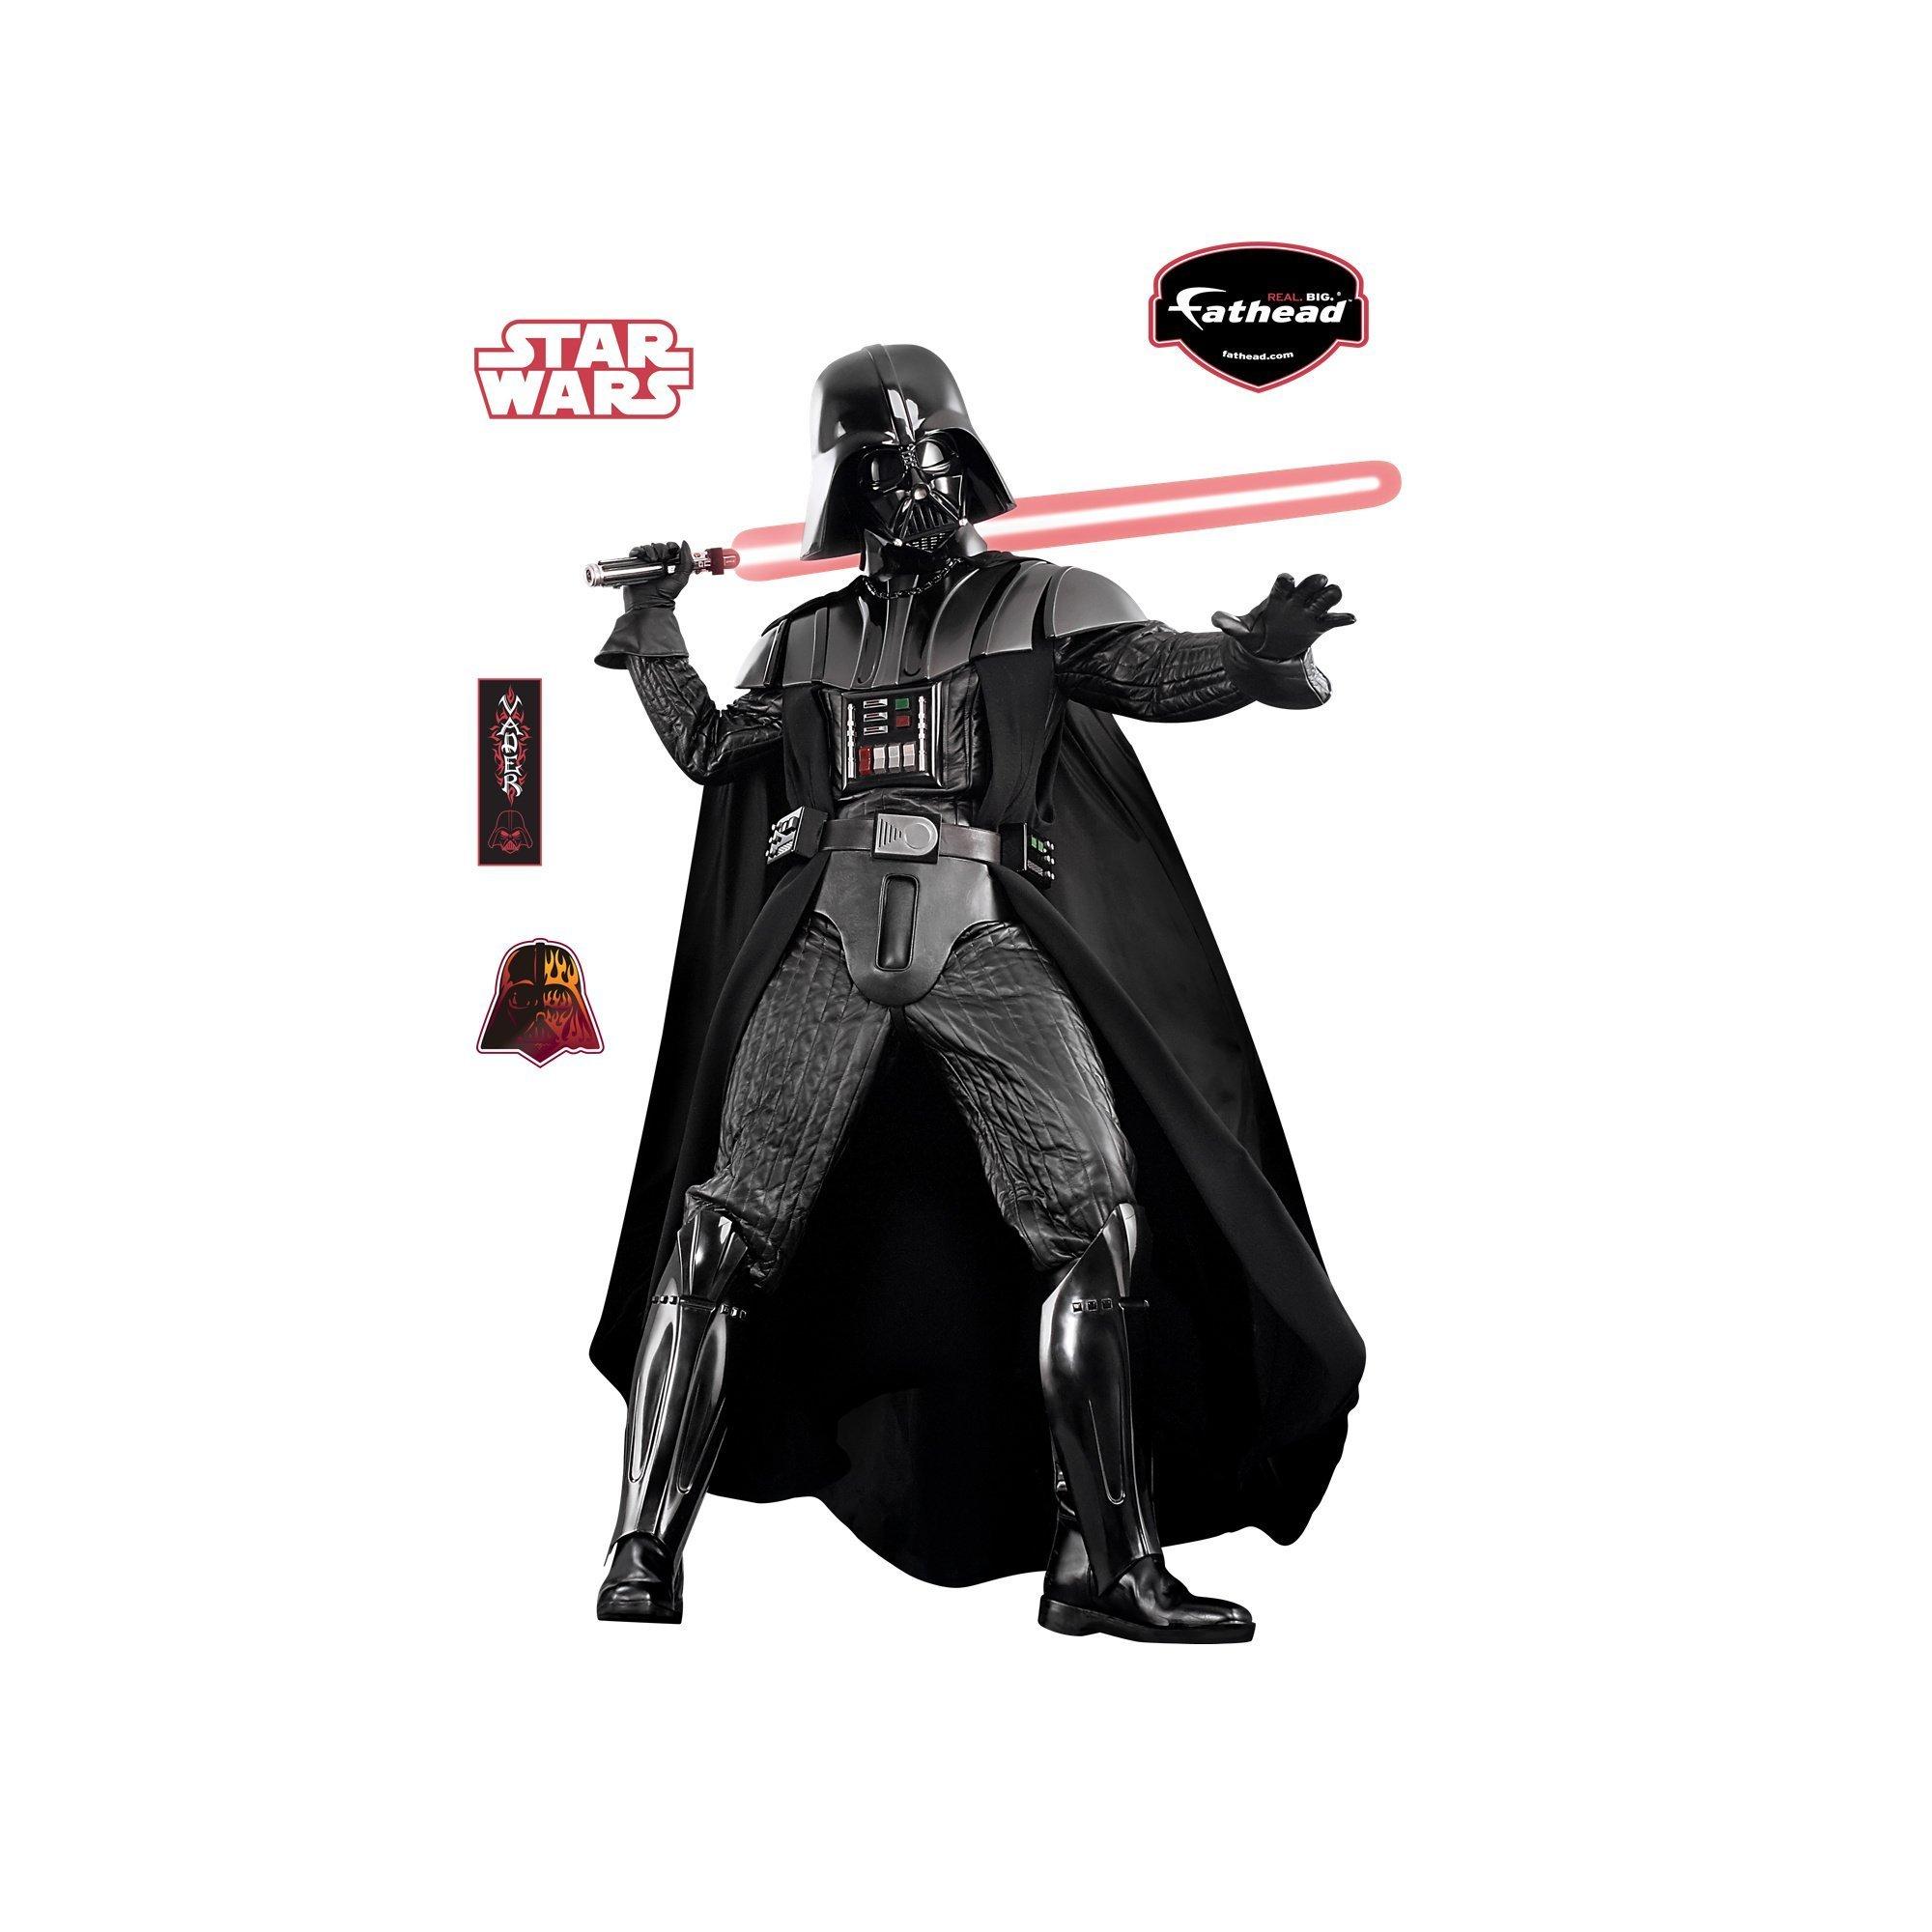 Fathead Darth Vader Wall Decal